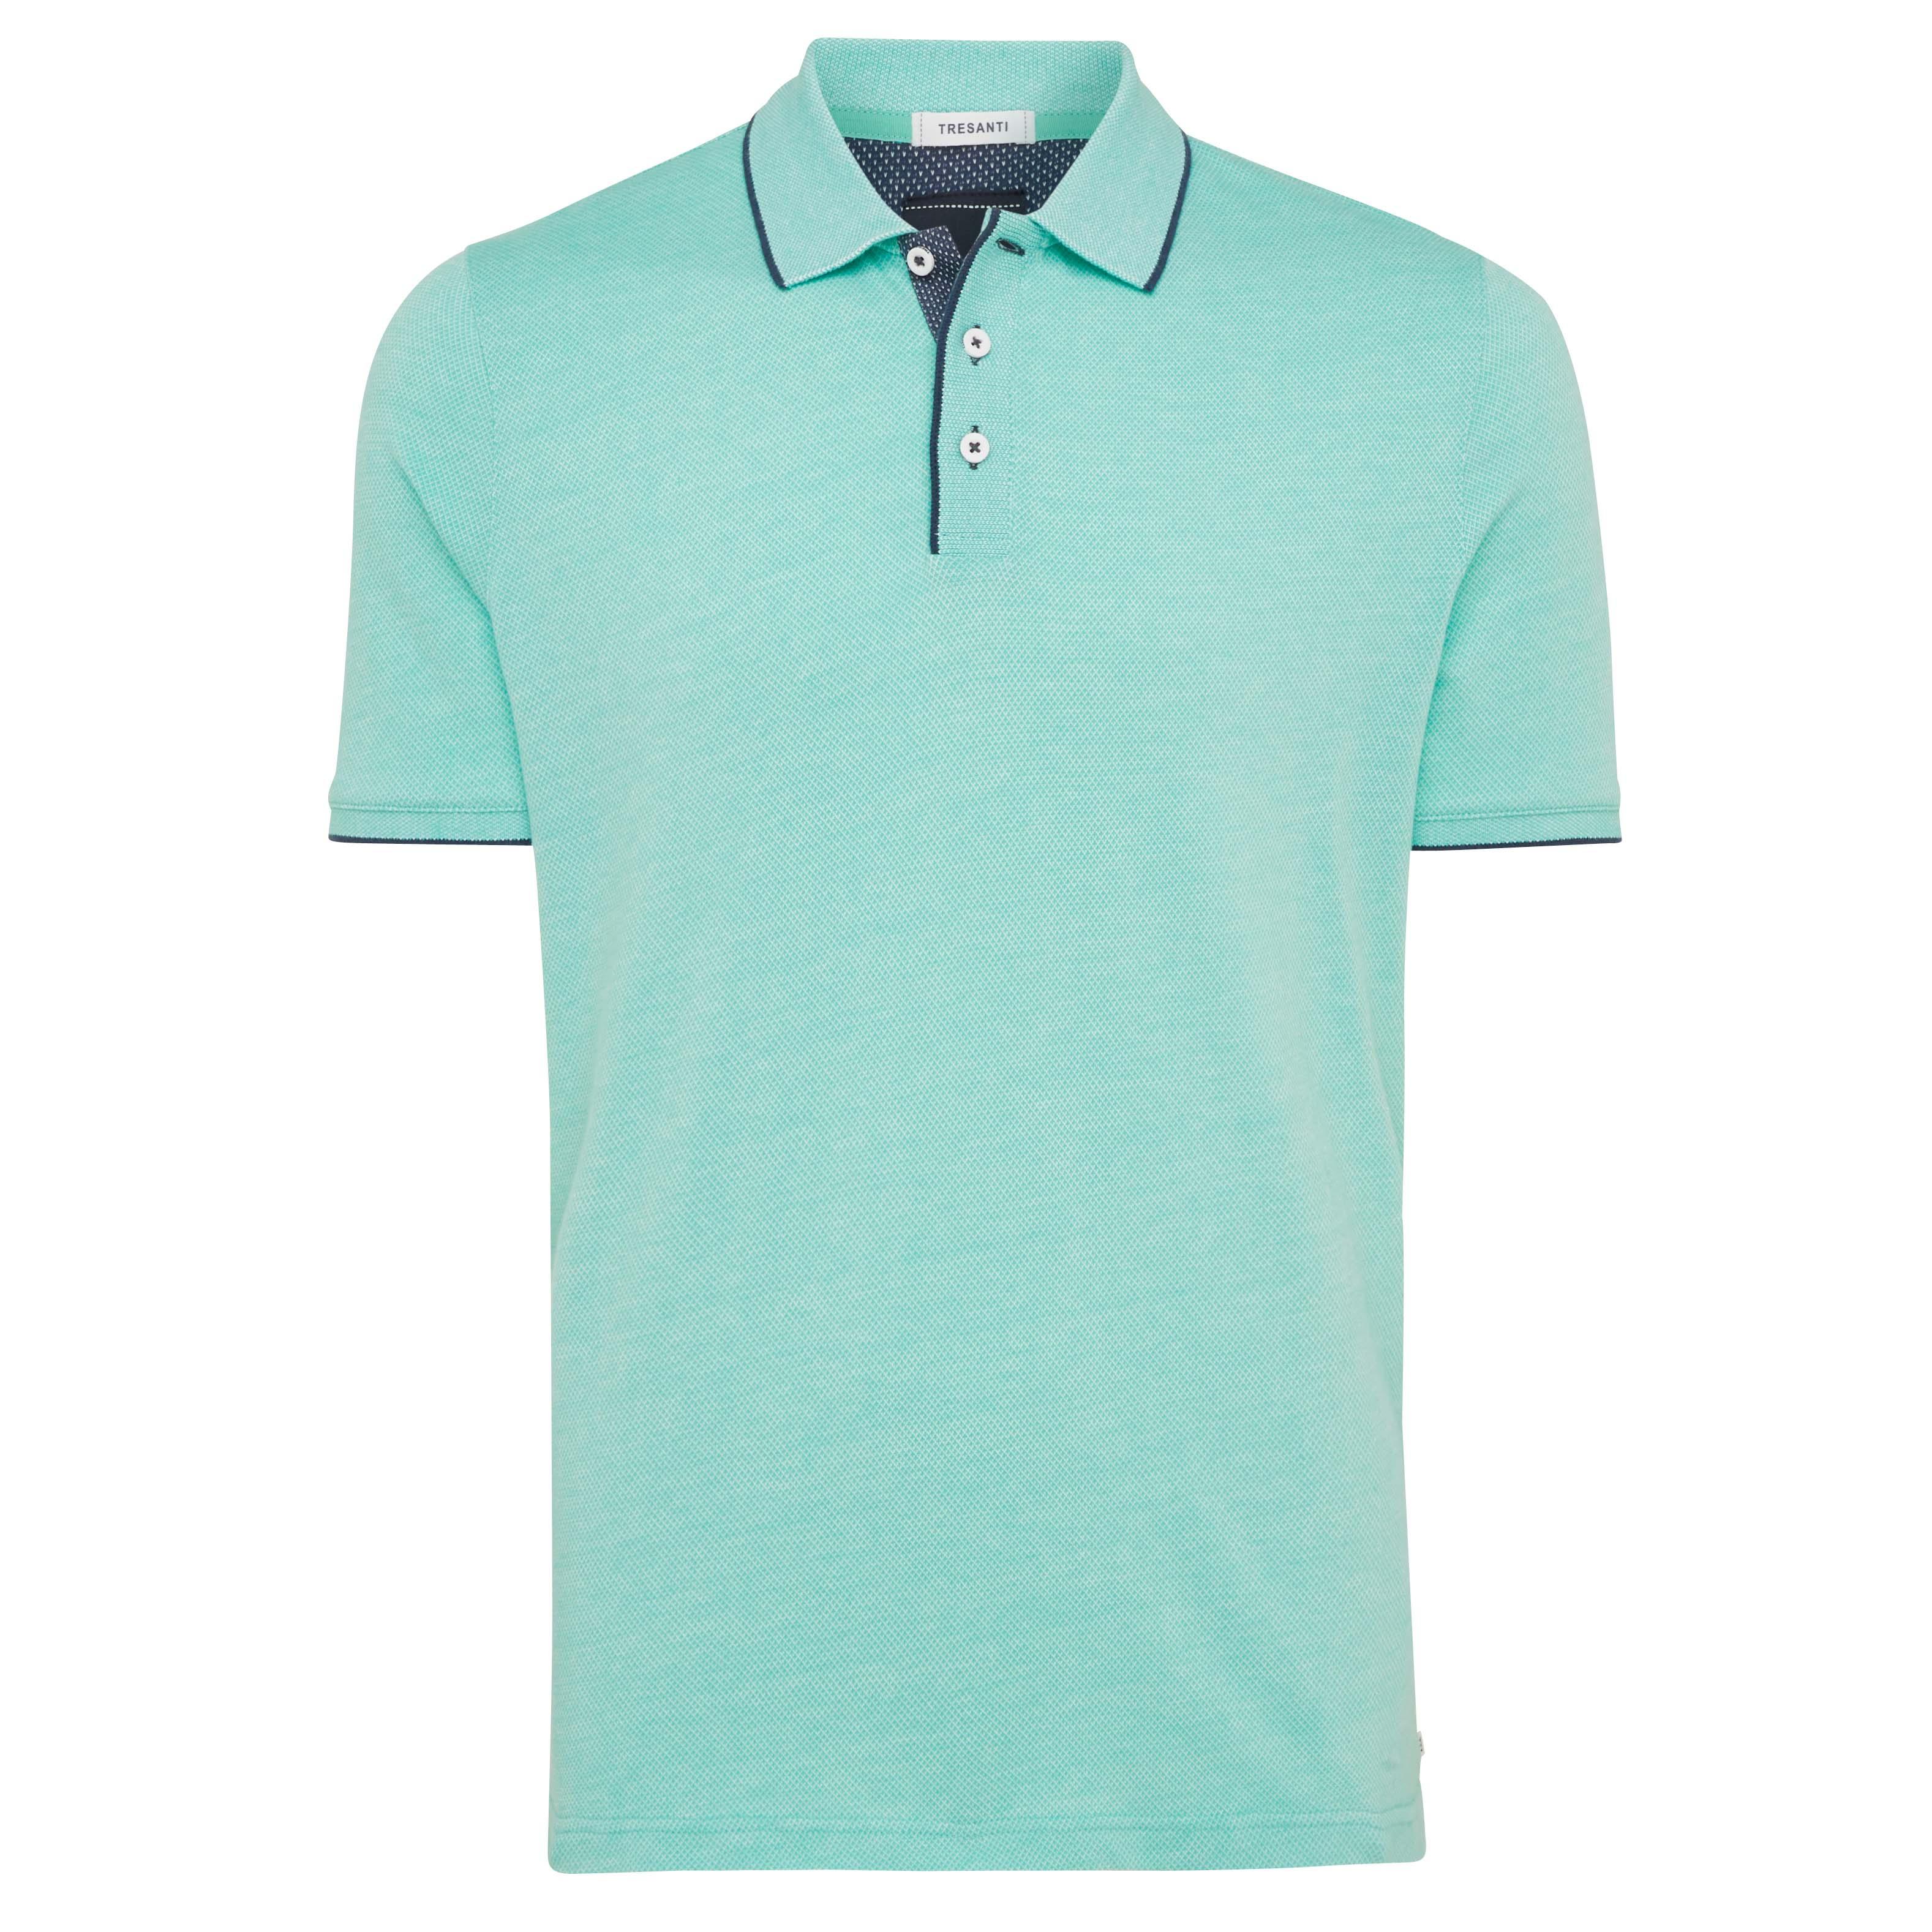 Tomas | Poloshirt mint green